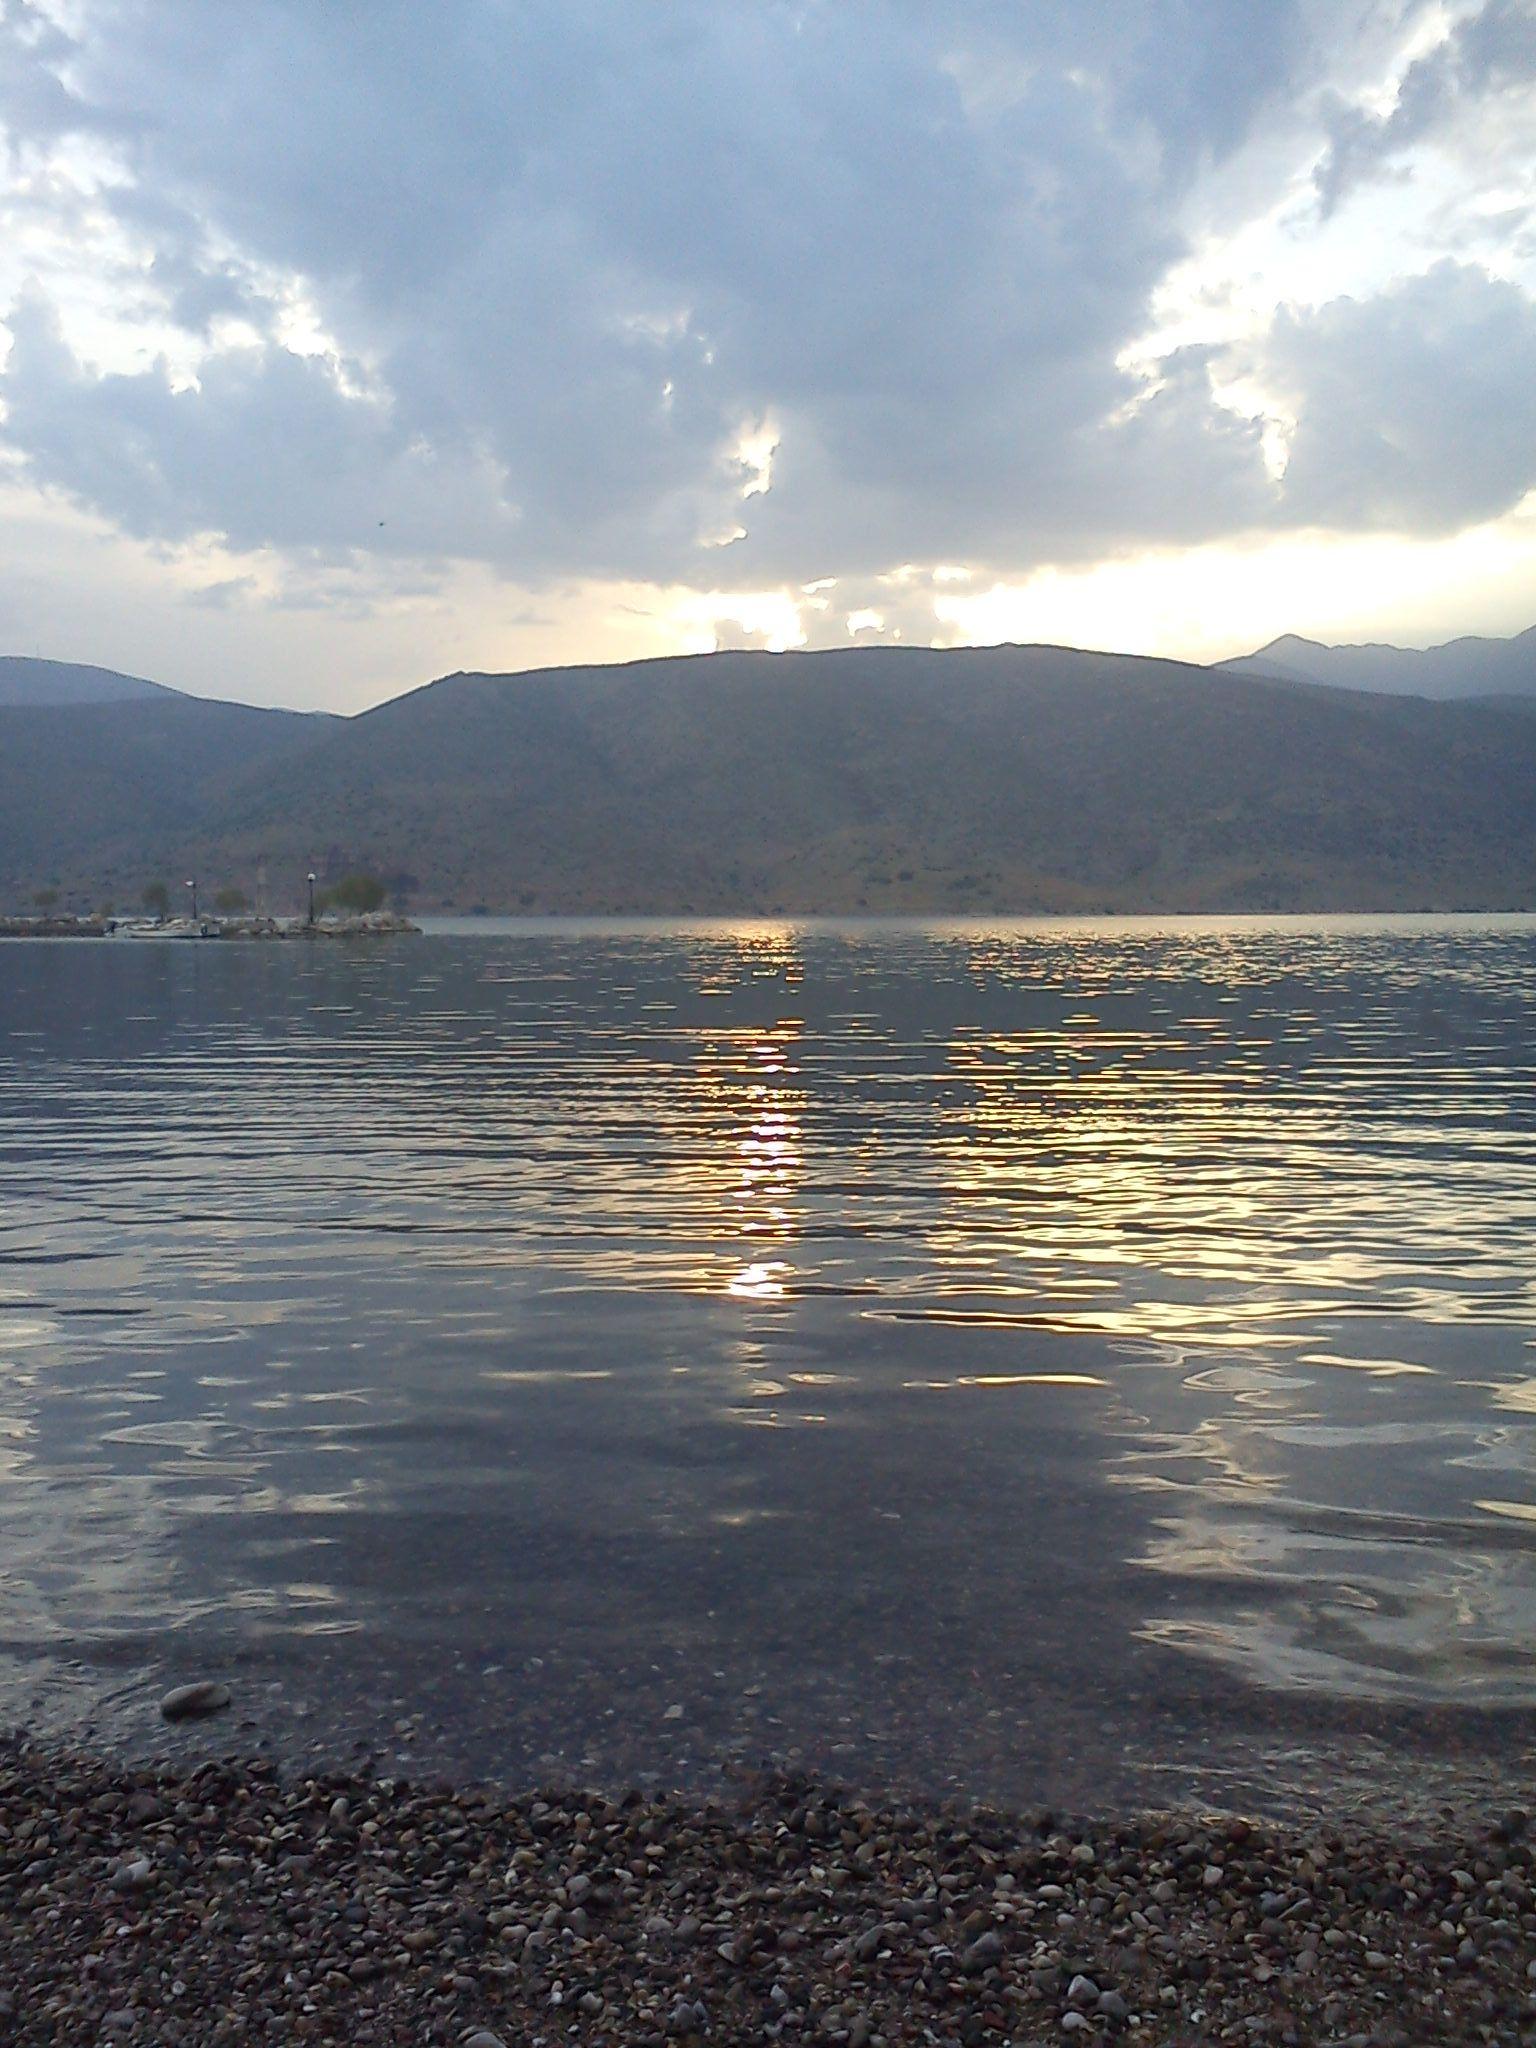 gulf of Itea, Sterea Ellada. Greece, Favorite places